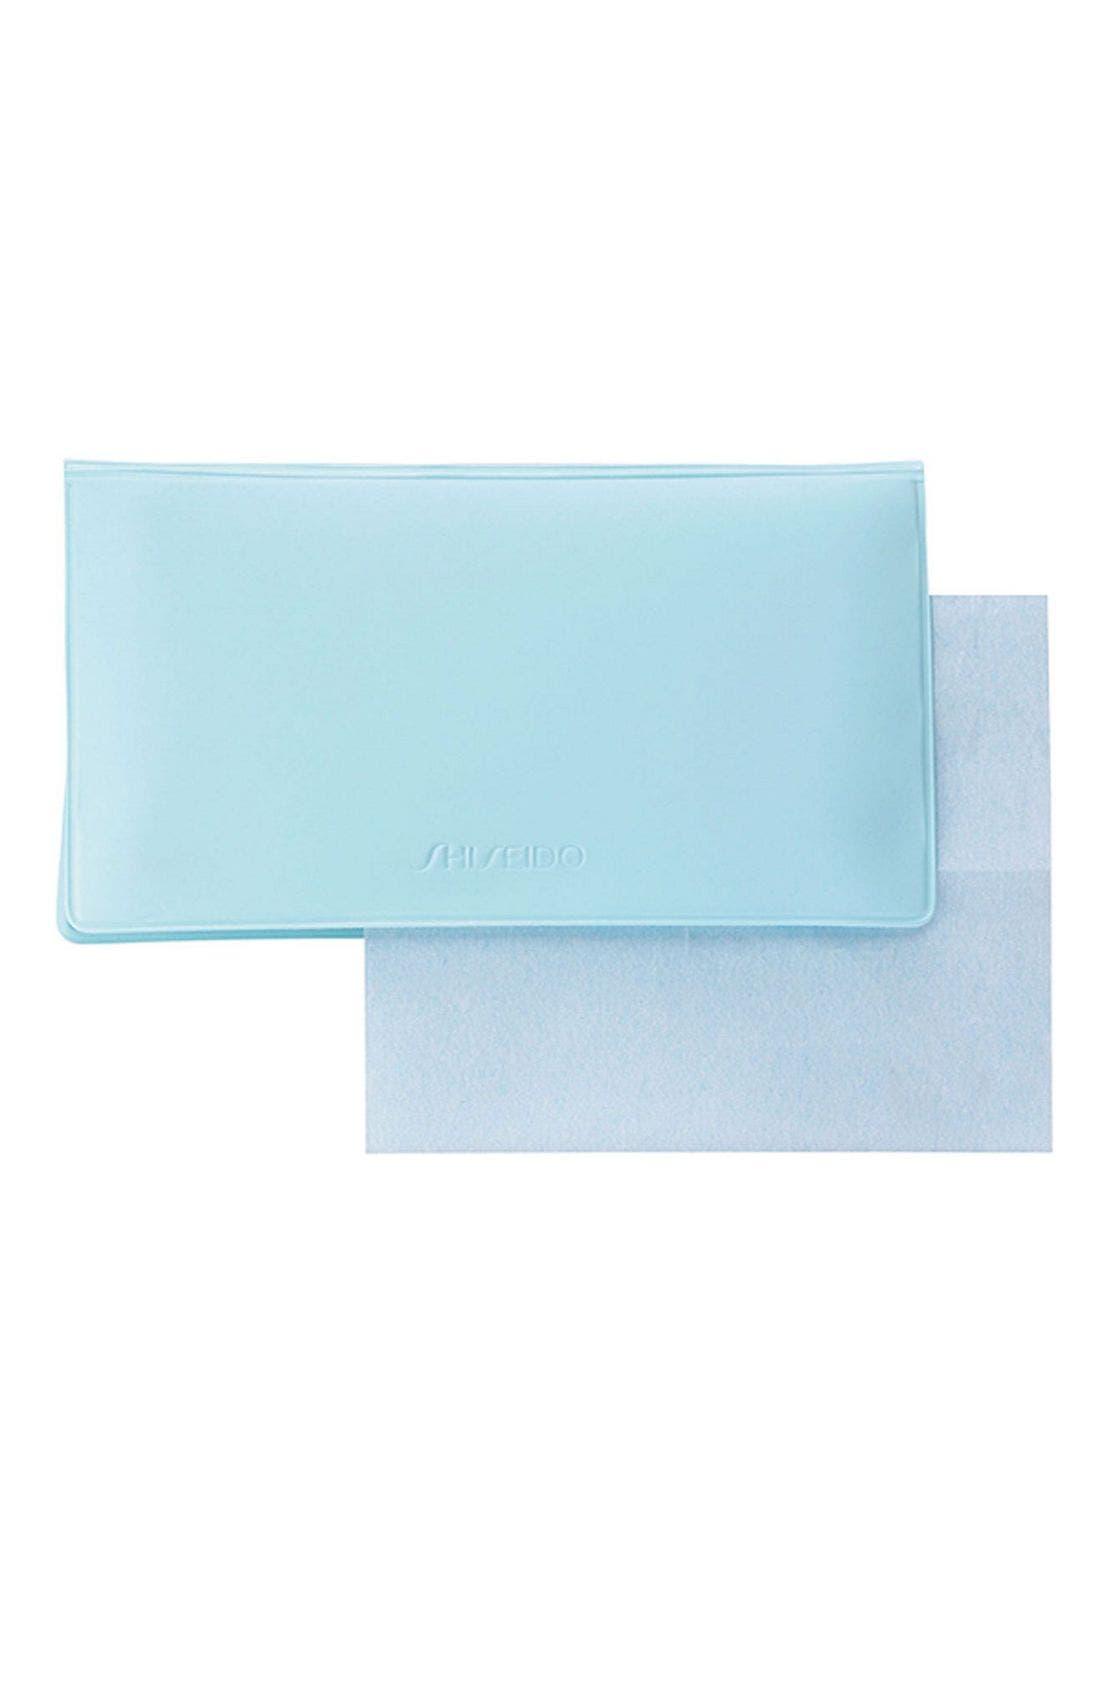 Shiseido 'Pureness' Oil-Control Blotting Paper